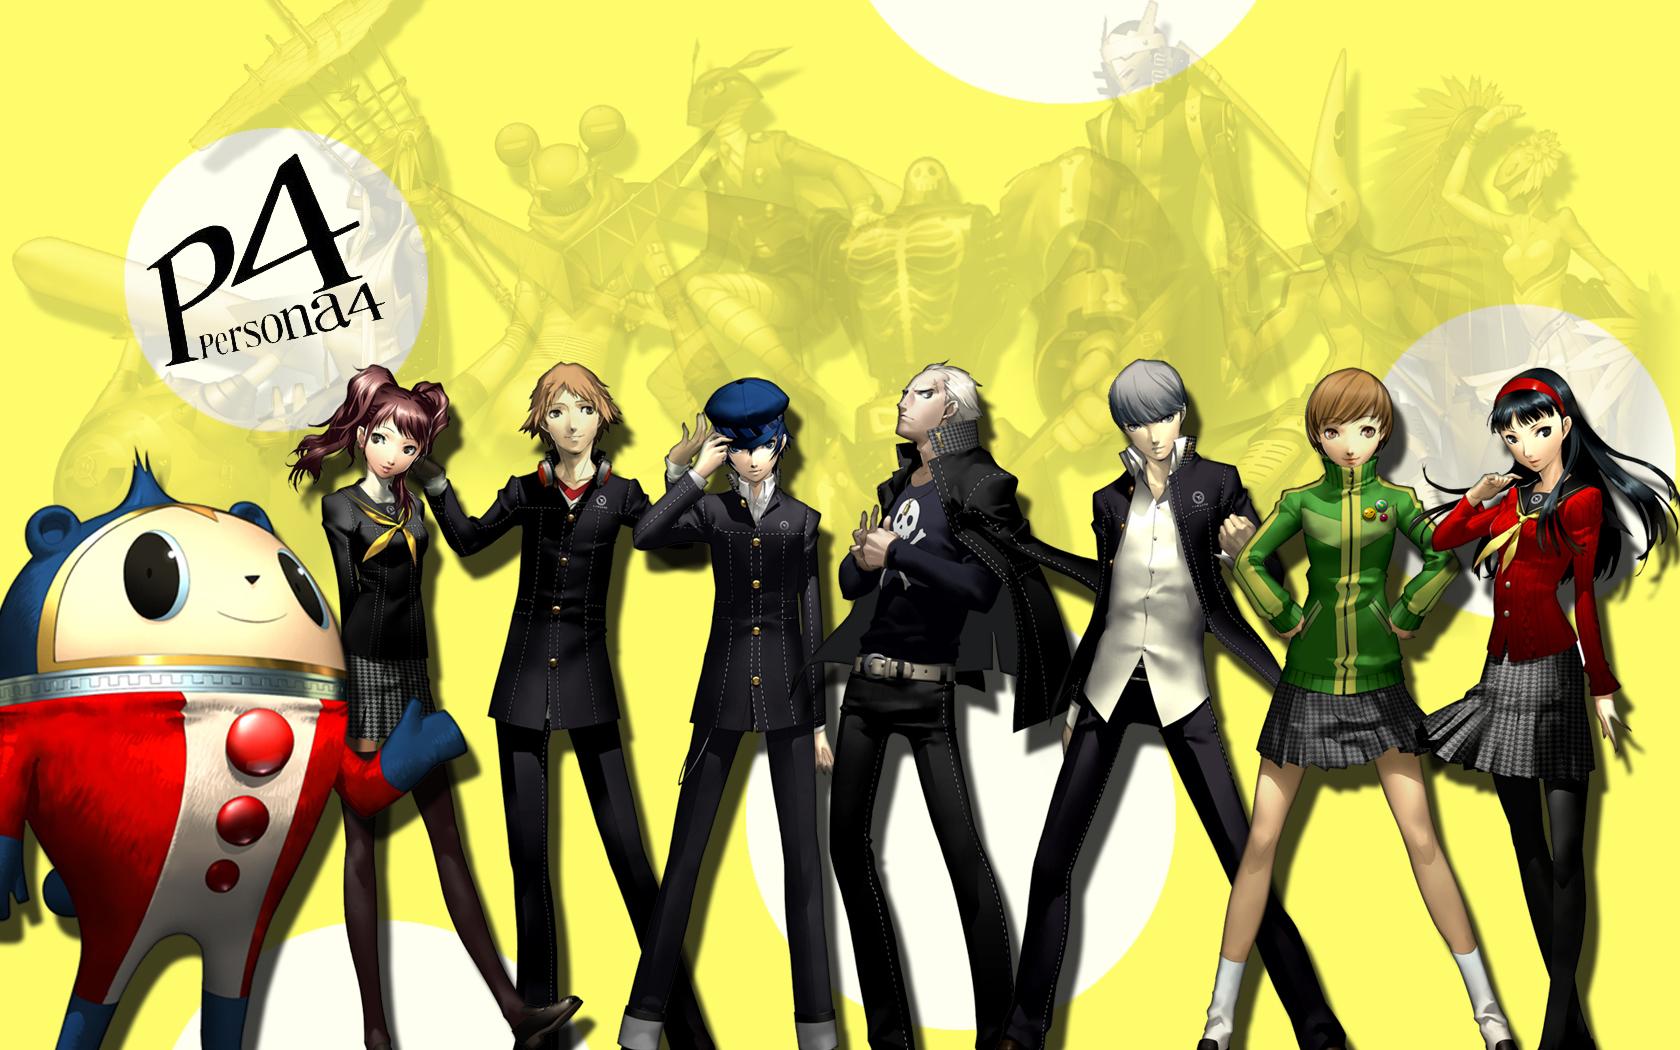 Persona 4 Anime Characters Database : Persona the animation anime no ryodan